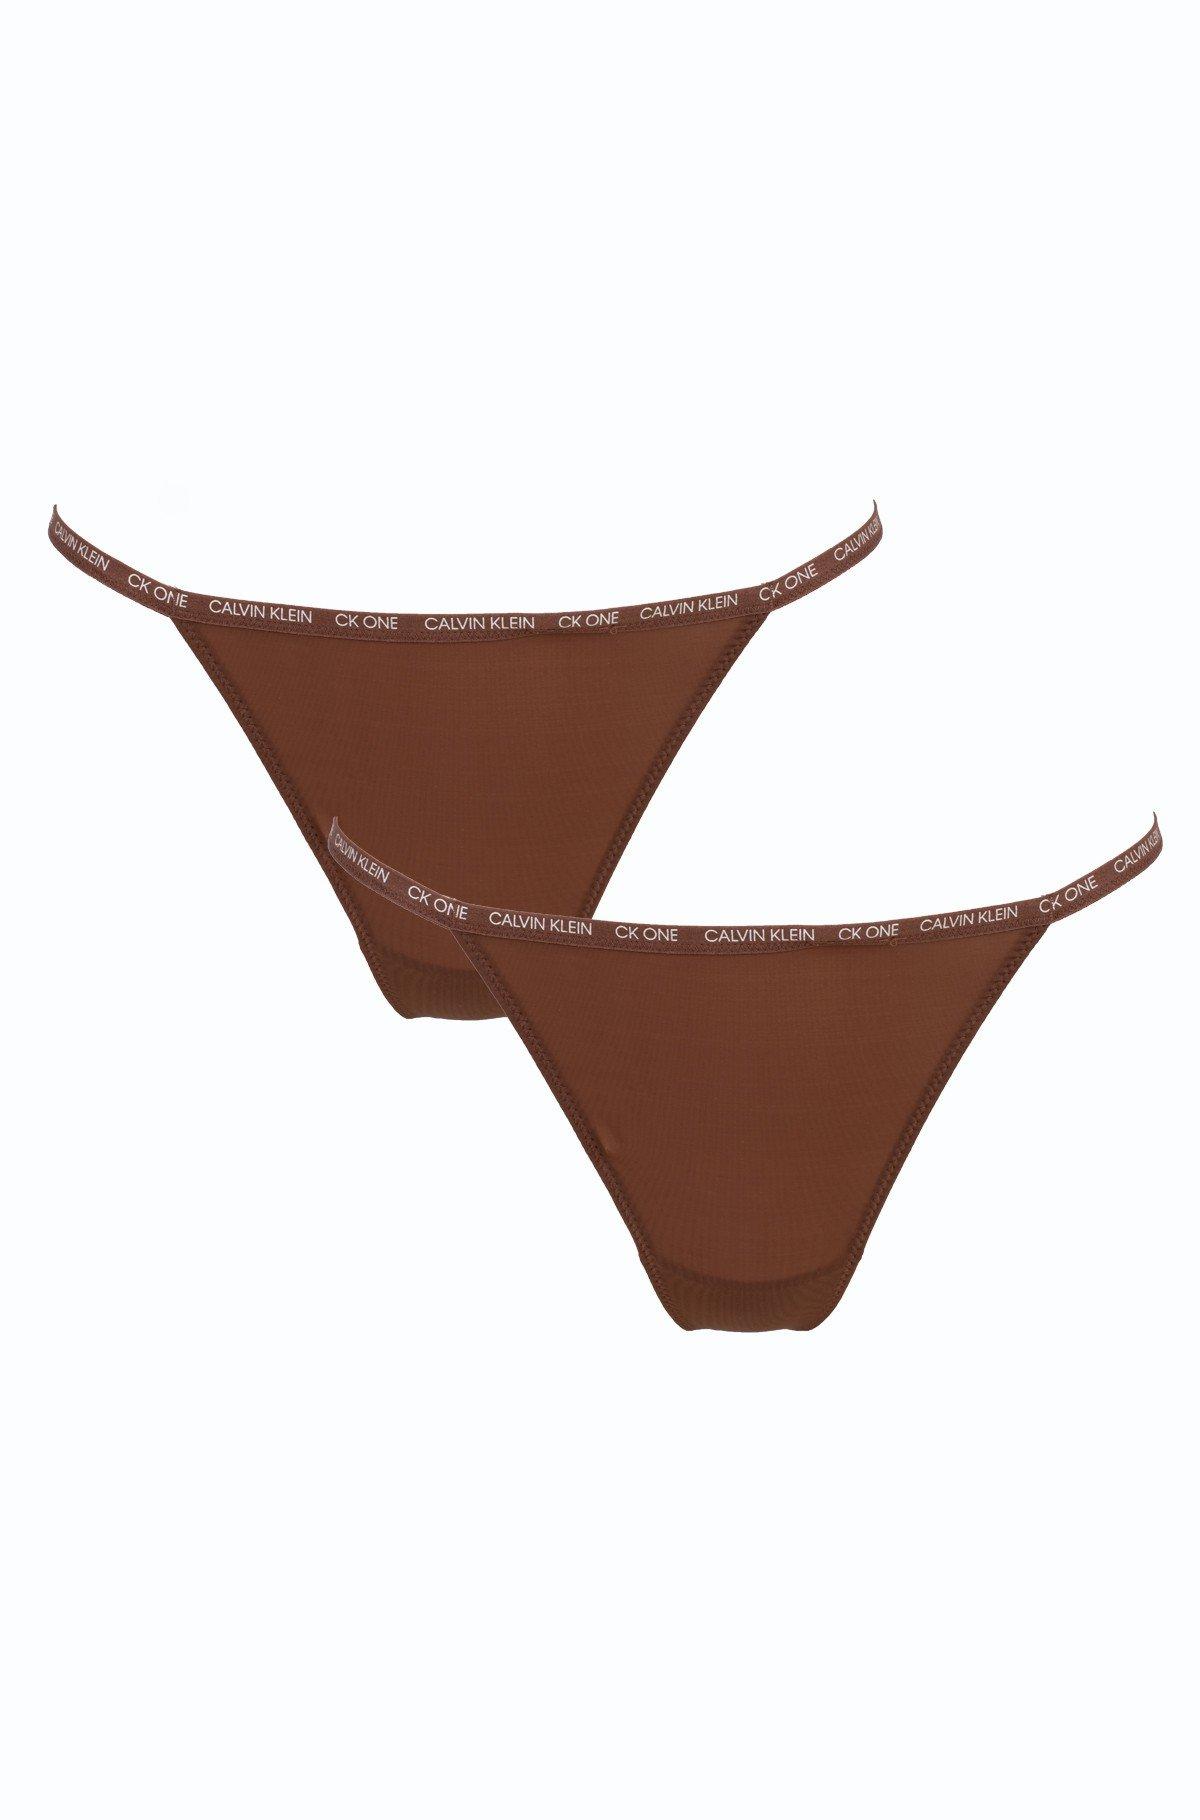 Thongs, 2-pack 000QD3807E-full-2